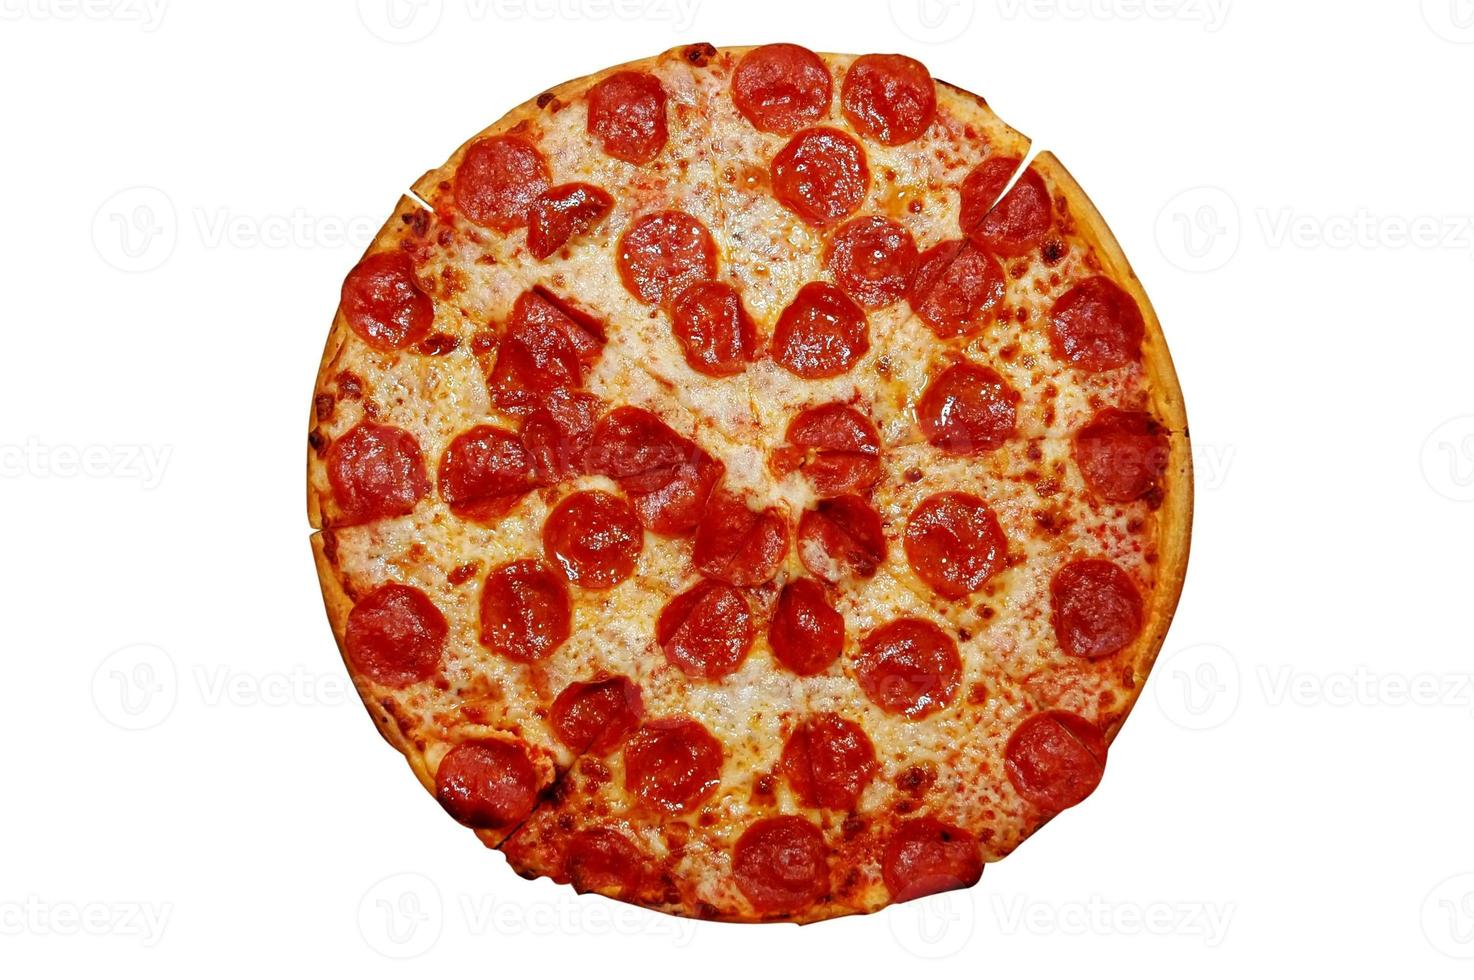 pizza de pepperoni entera foto